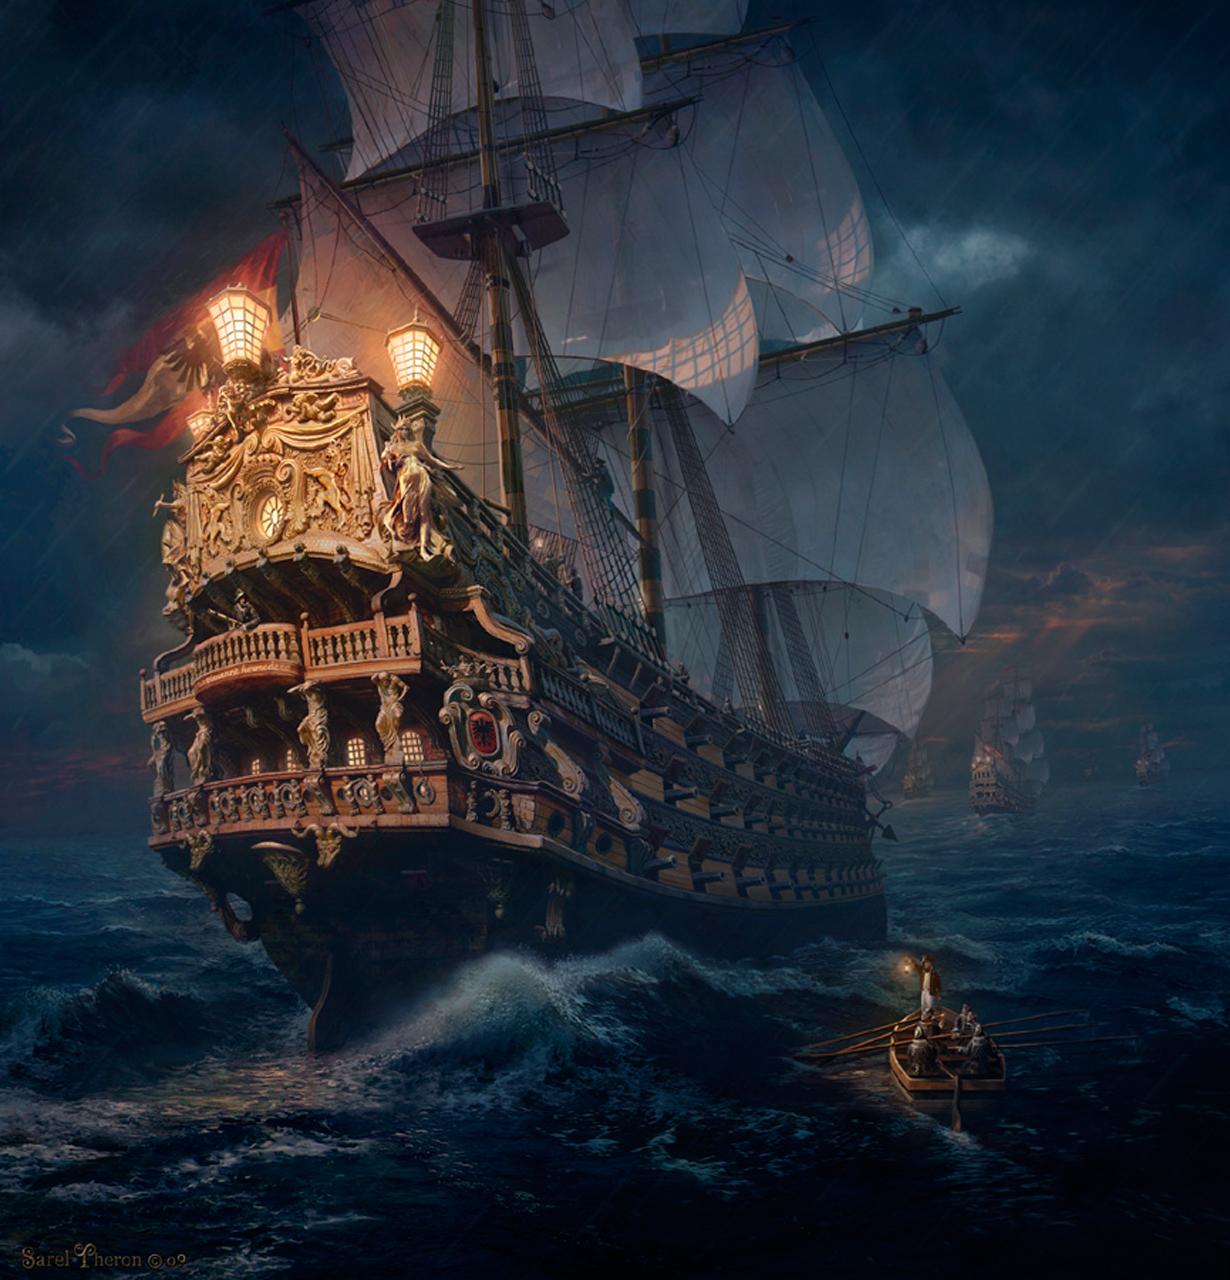 Pirates of the burning sea concept art - photo#9